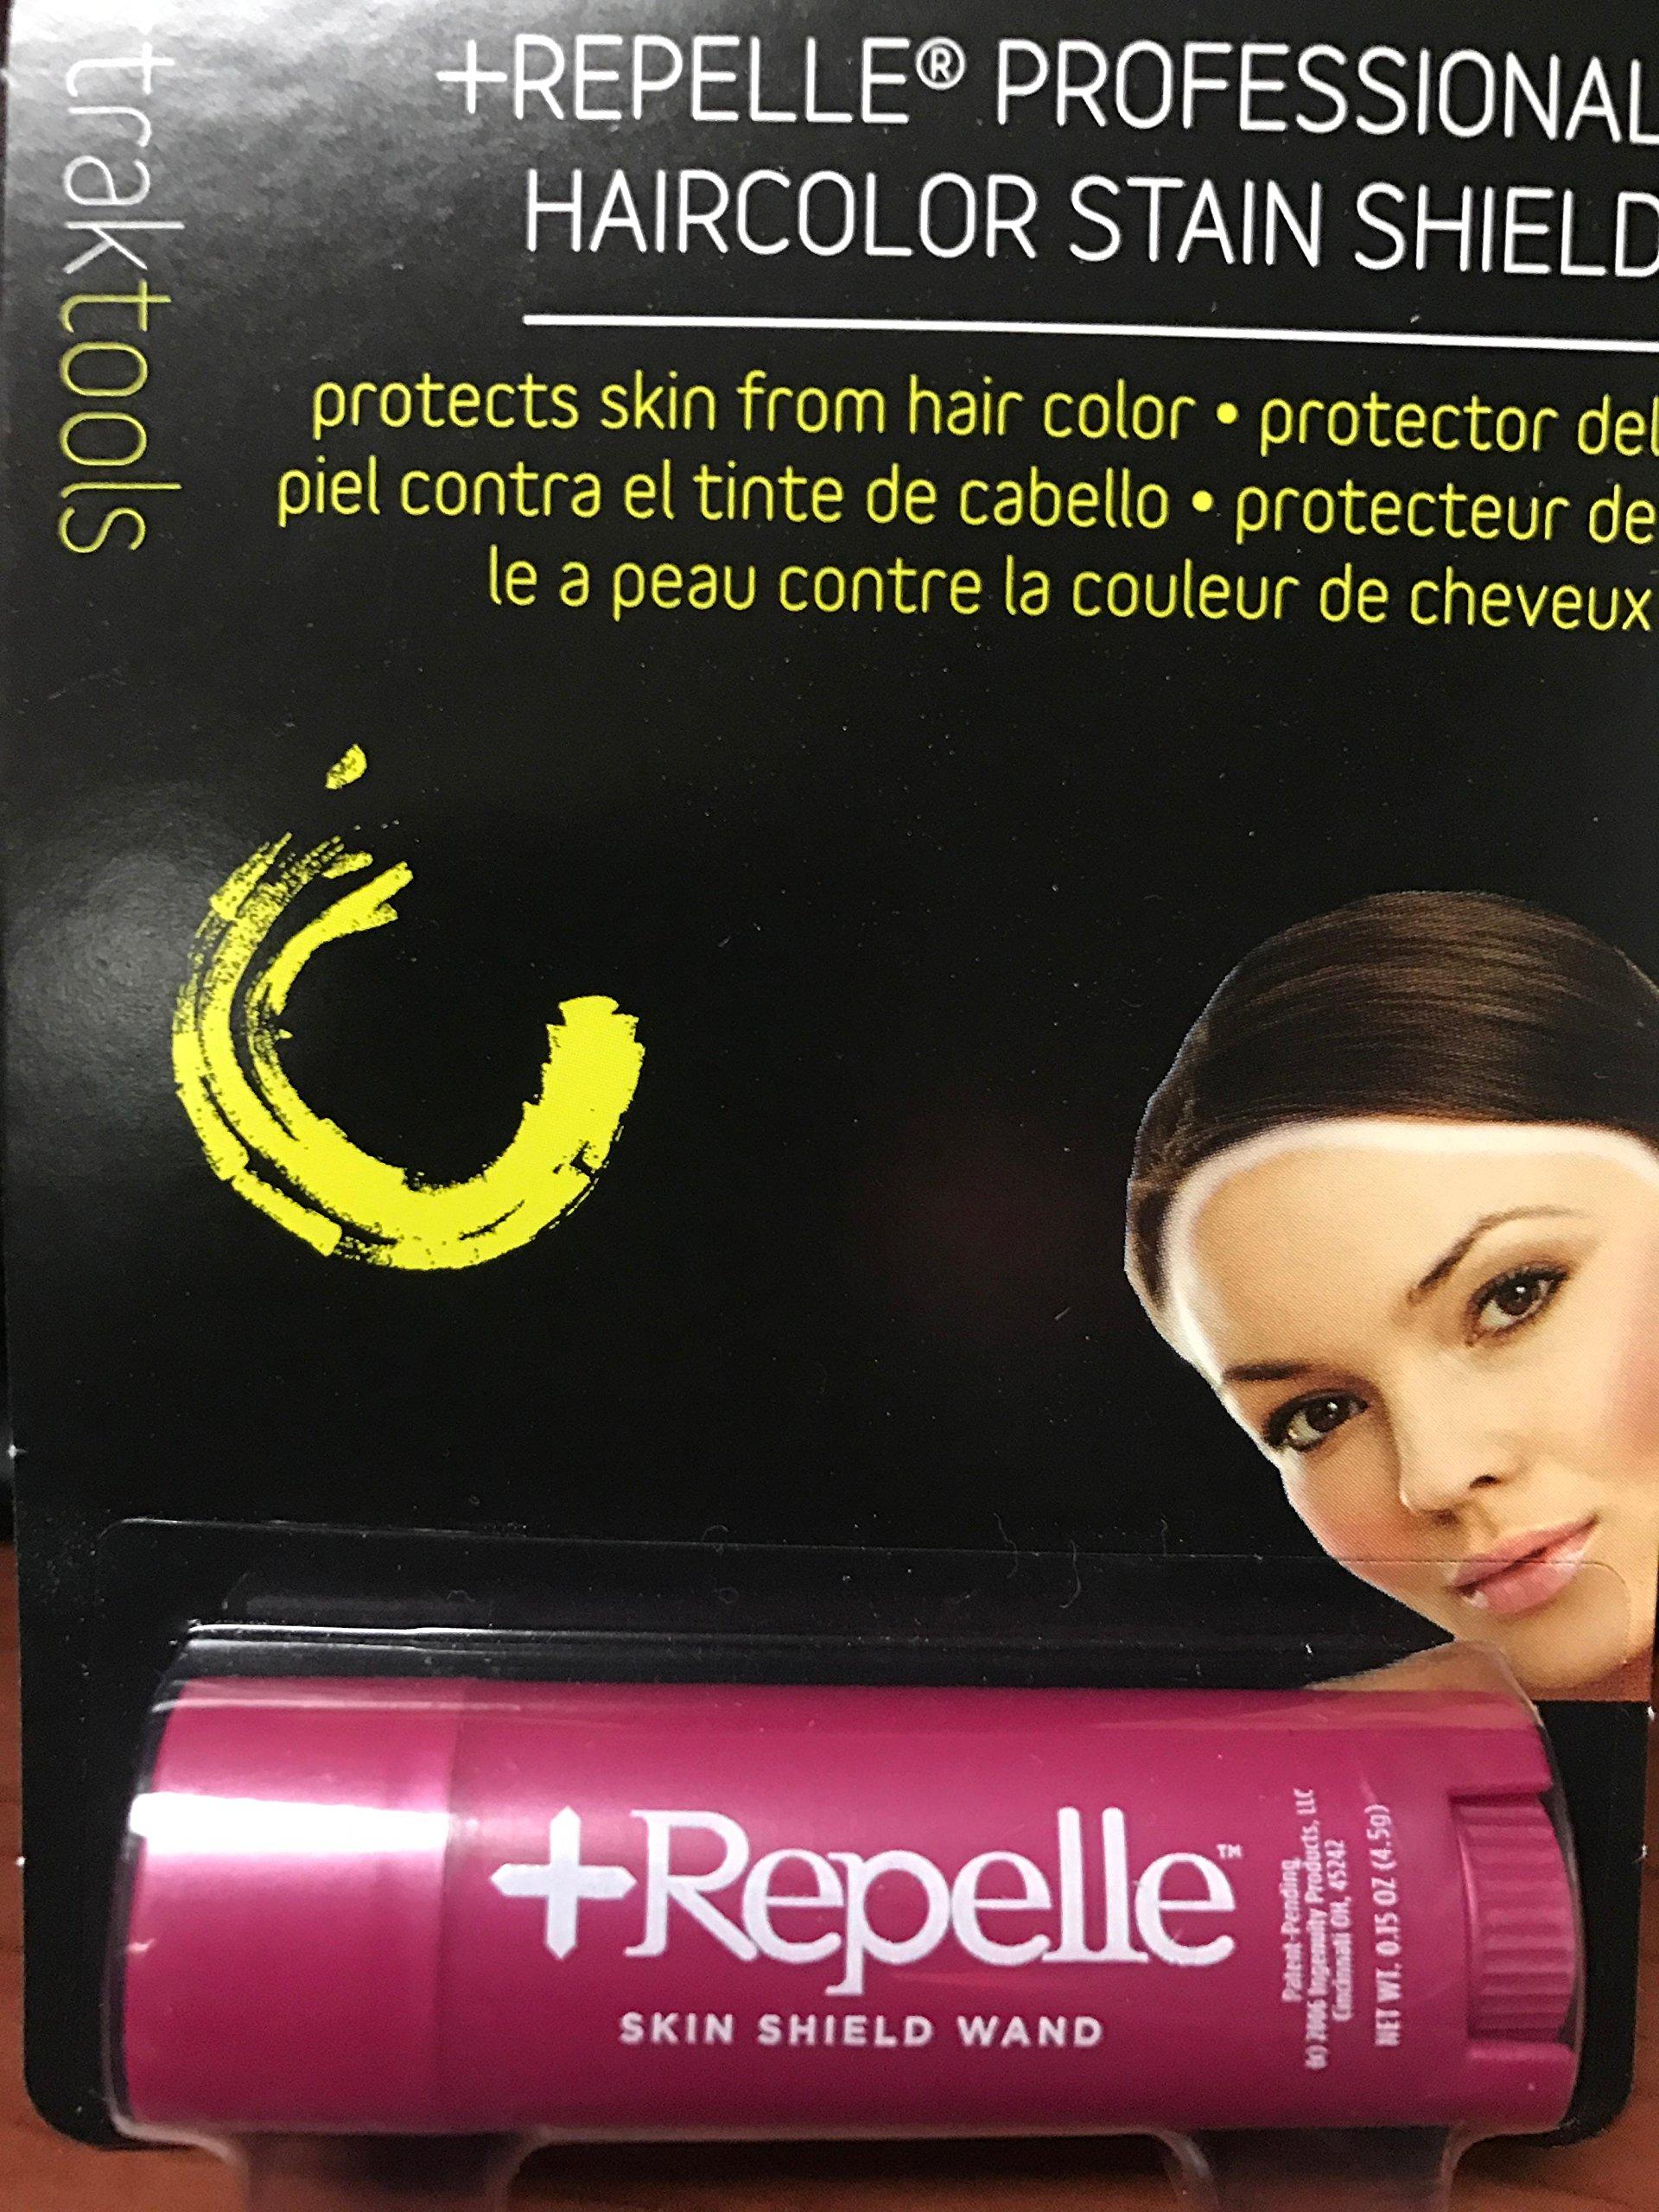 Amazon Colortrak Repelle Professional Haircolor Stain Shield